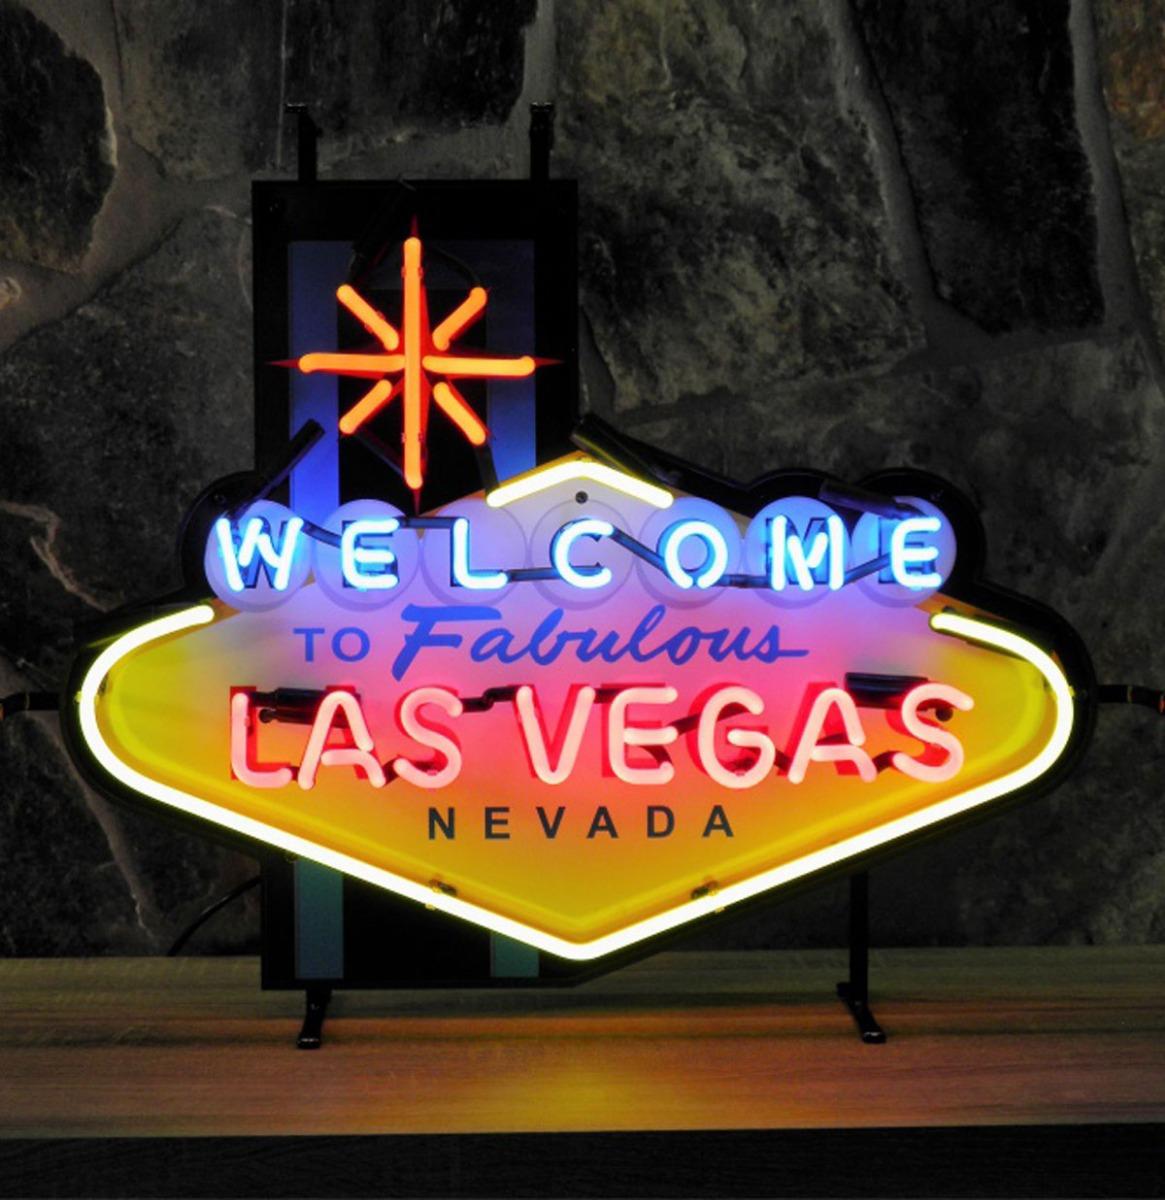 Las Vegas Nevada Neon Verlichting Met Bord 74 x 58 cm